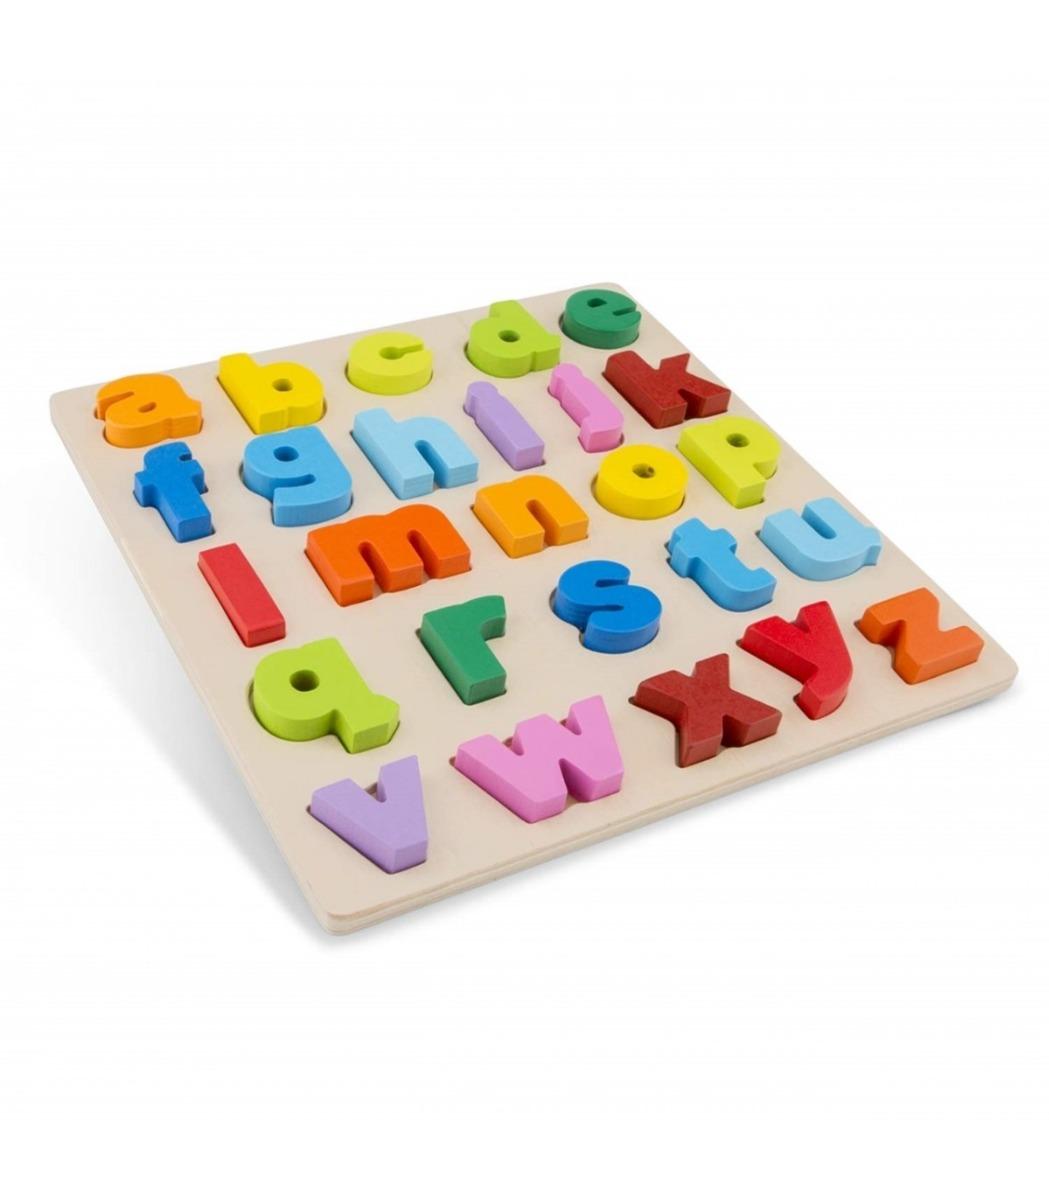 Puzzle alfabet cu litere mici din lemn New Classic Toys imagine hippoland.ro